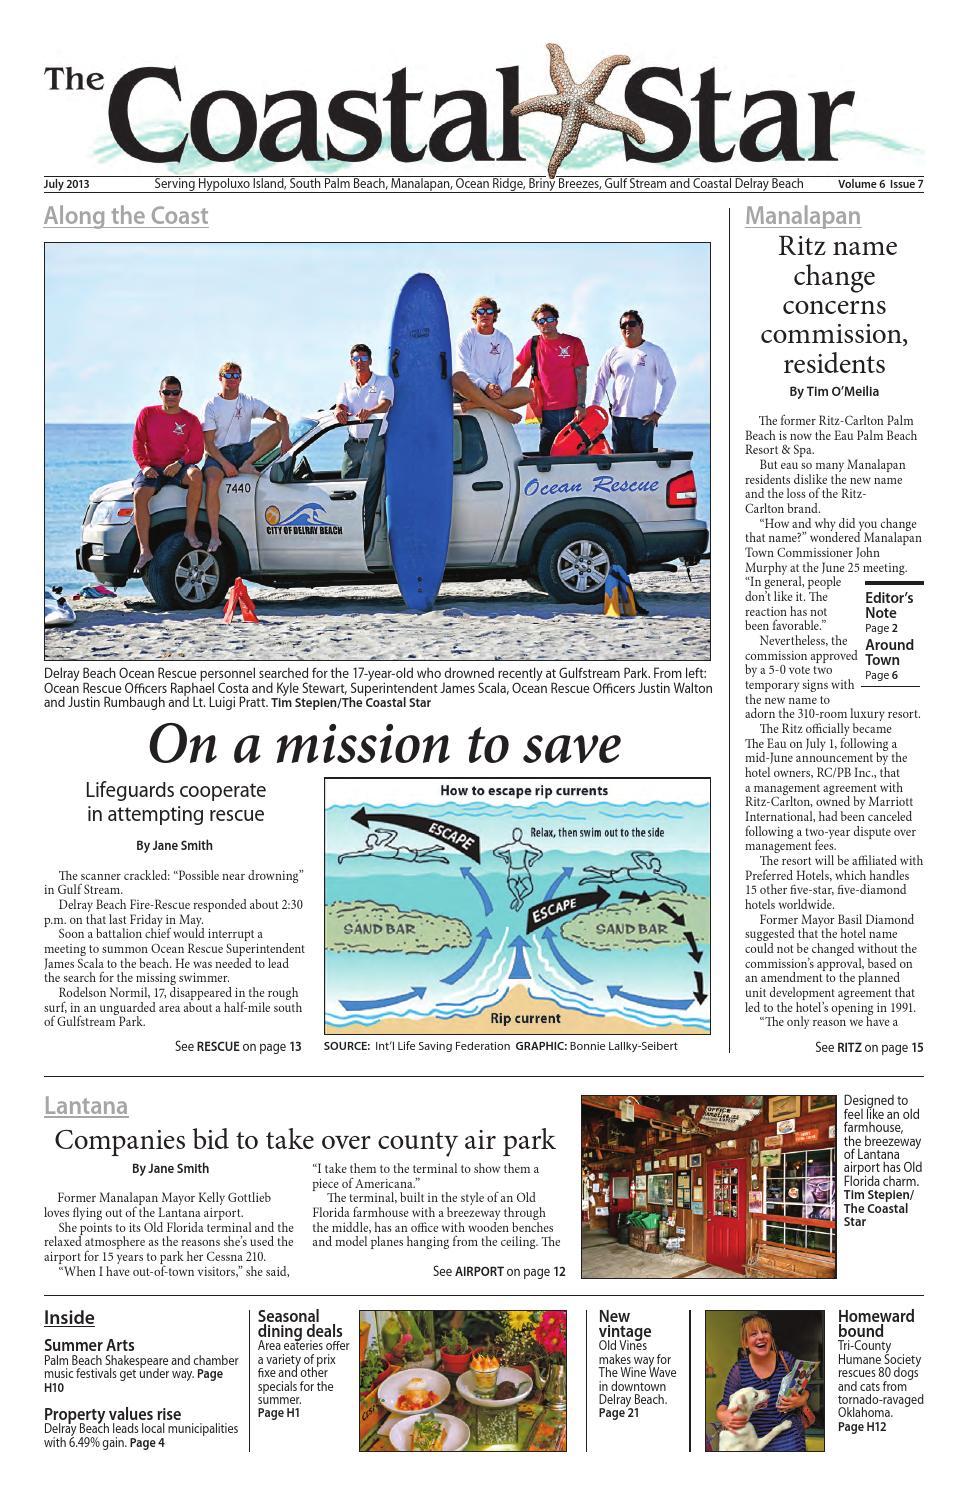 The Coastal Star July 2013 by The Coastal Star - issuu